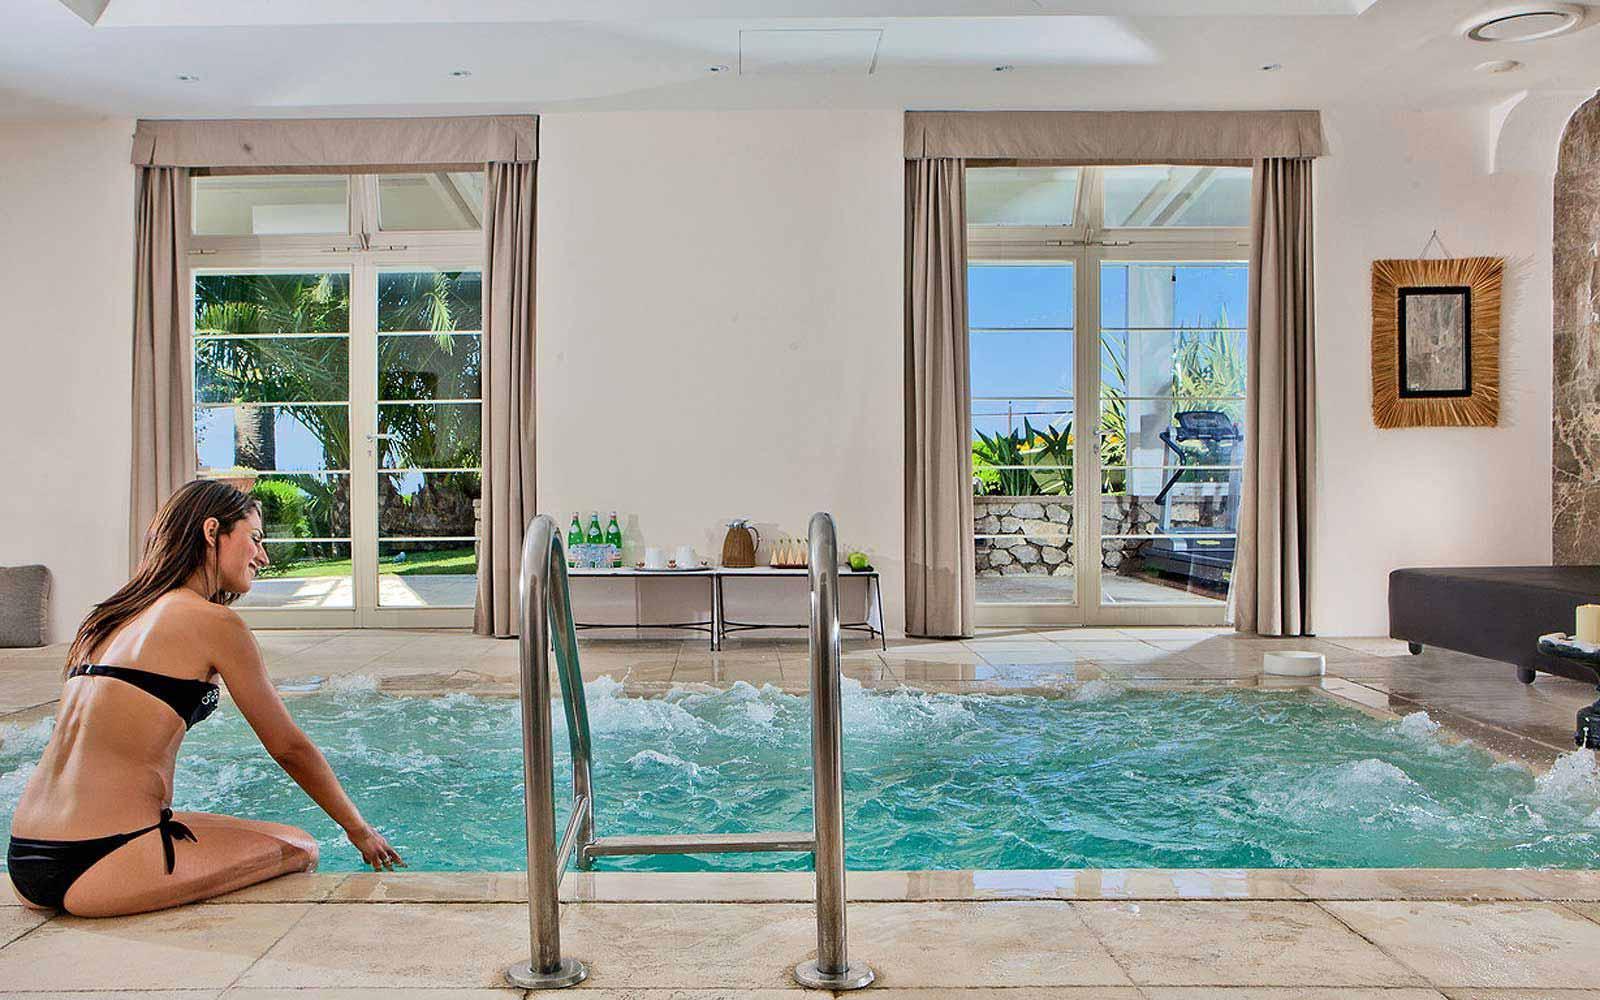 Spa pool at Villa Marini Capri Hotel & Spa